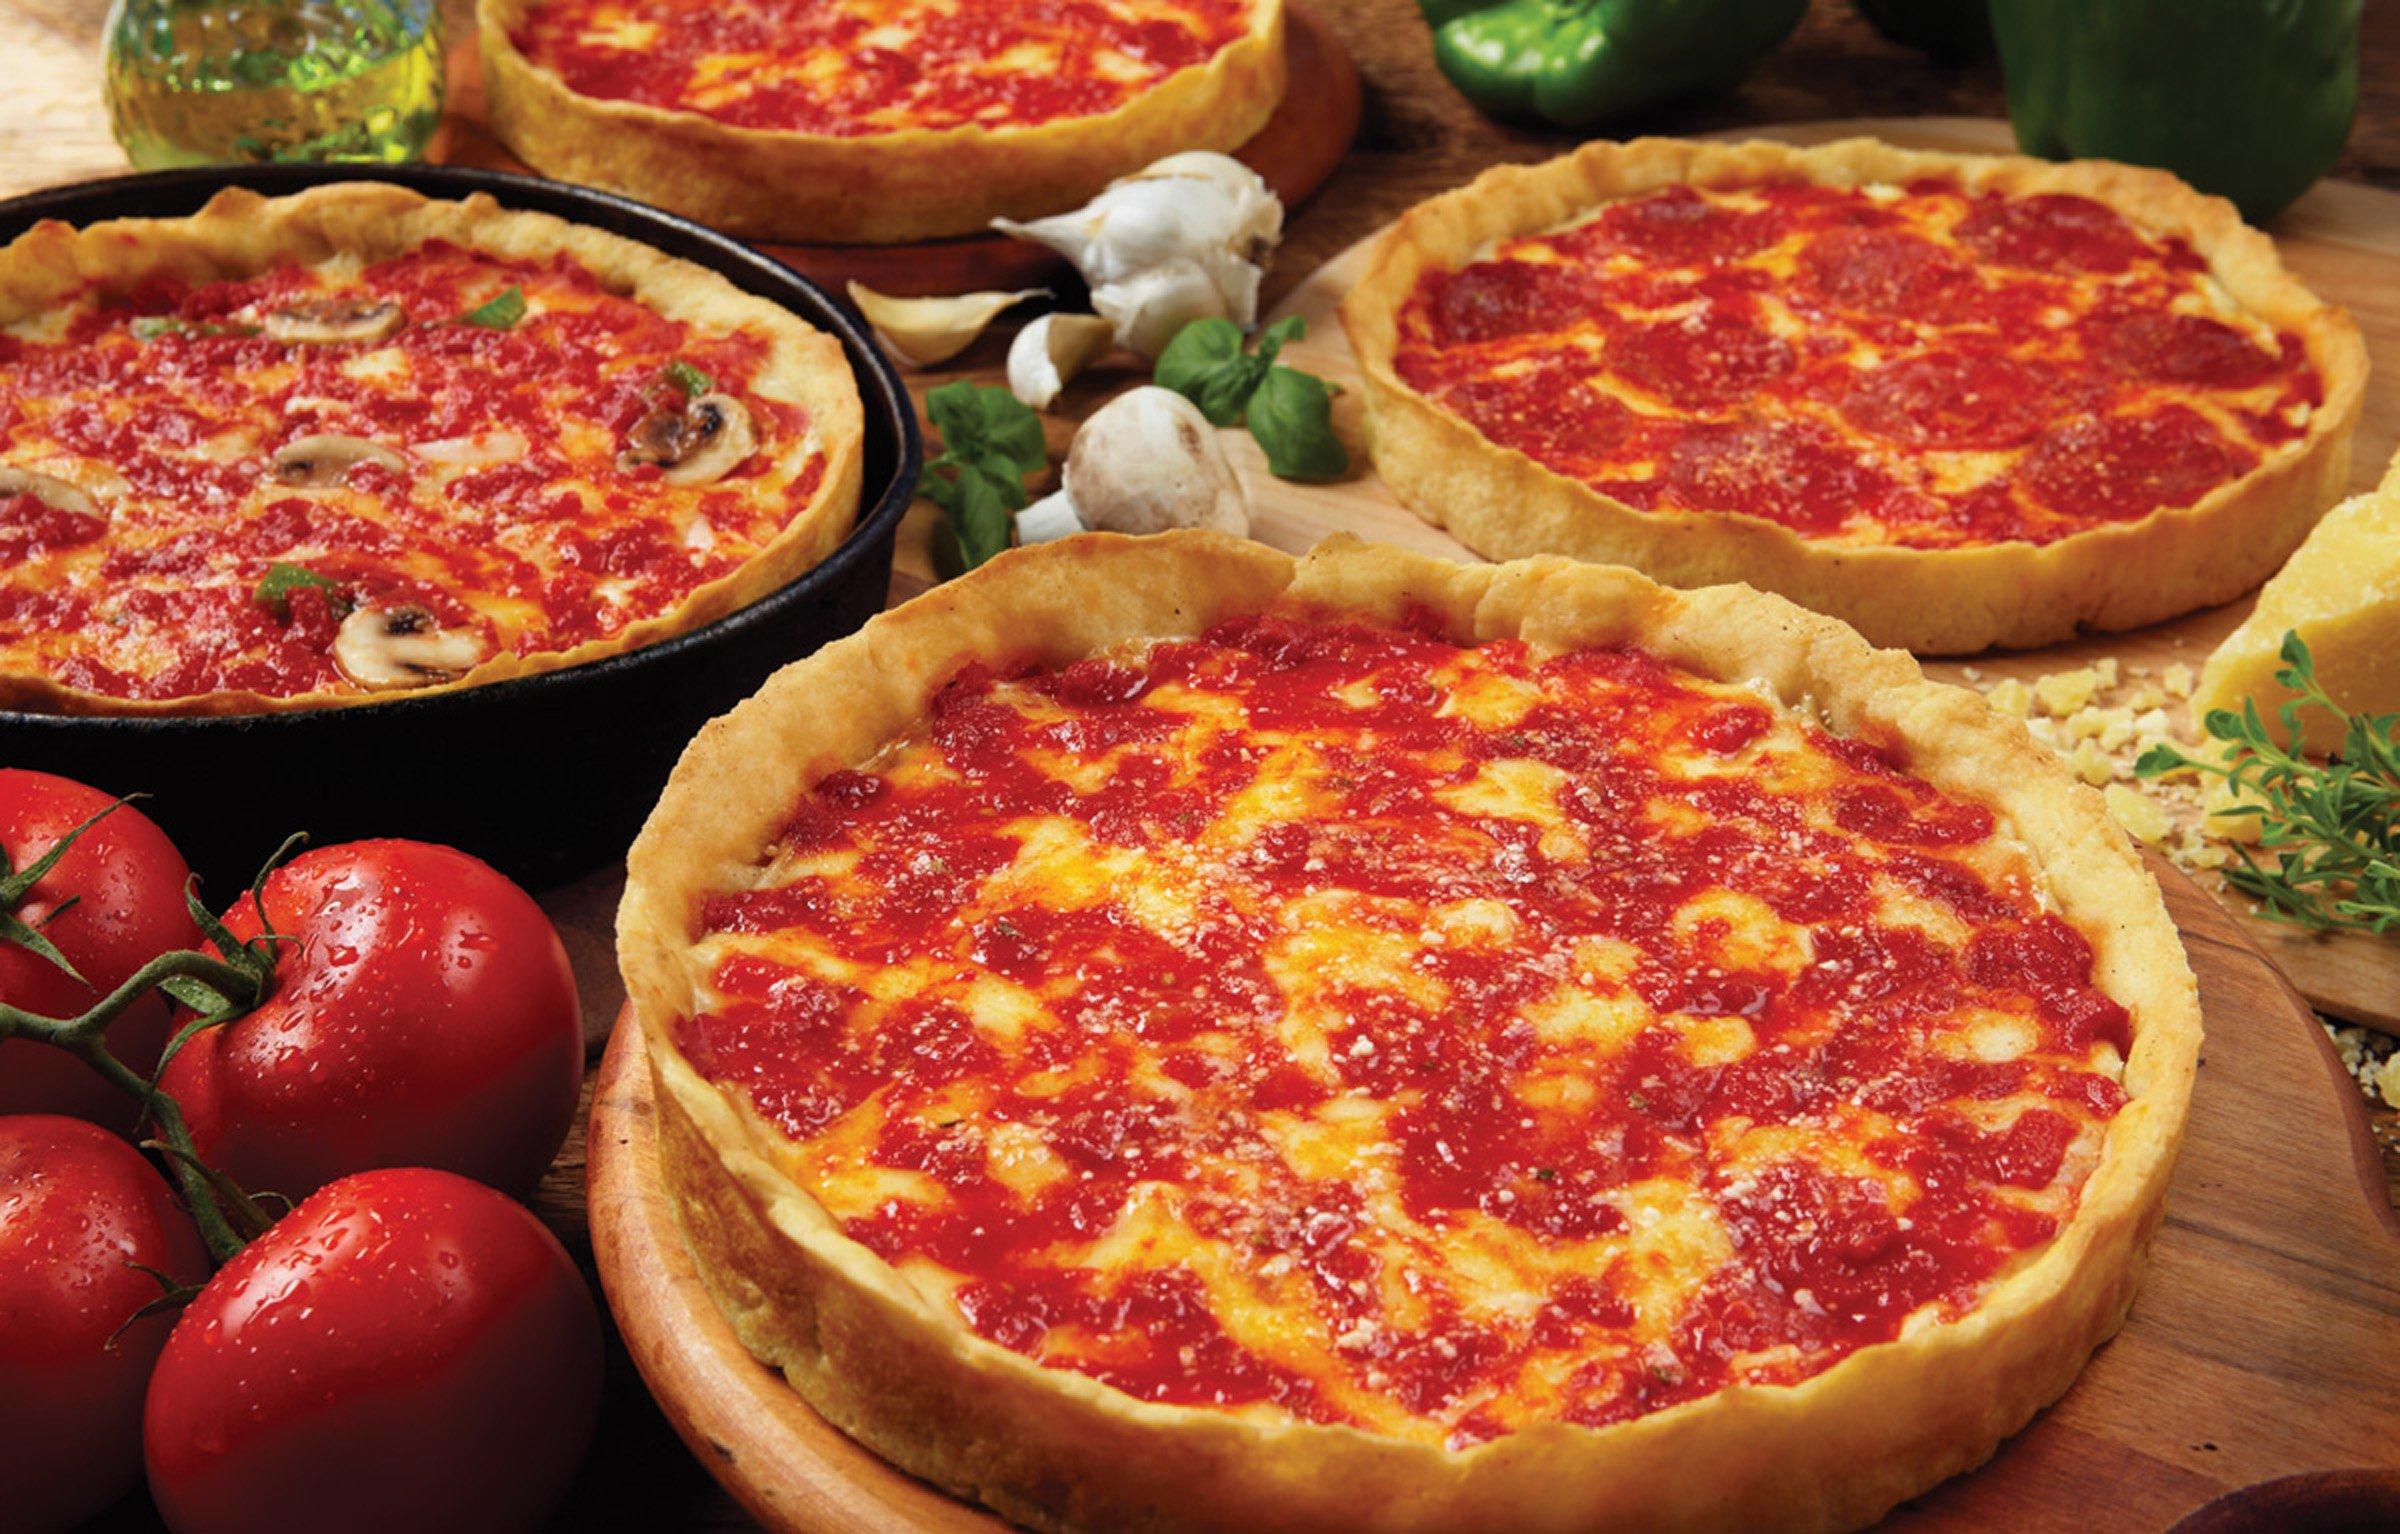 4 Lou Malnati's Chicago-style Deep Dish Pizzas (2 Cheese & 2 Pepperoni)